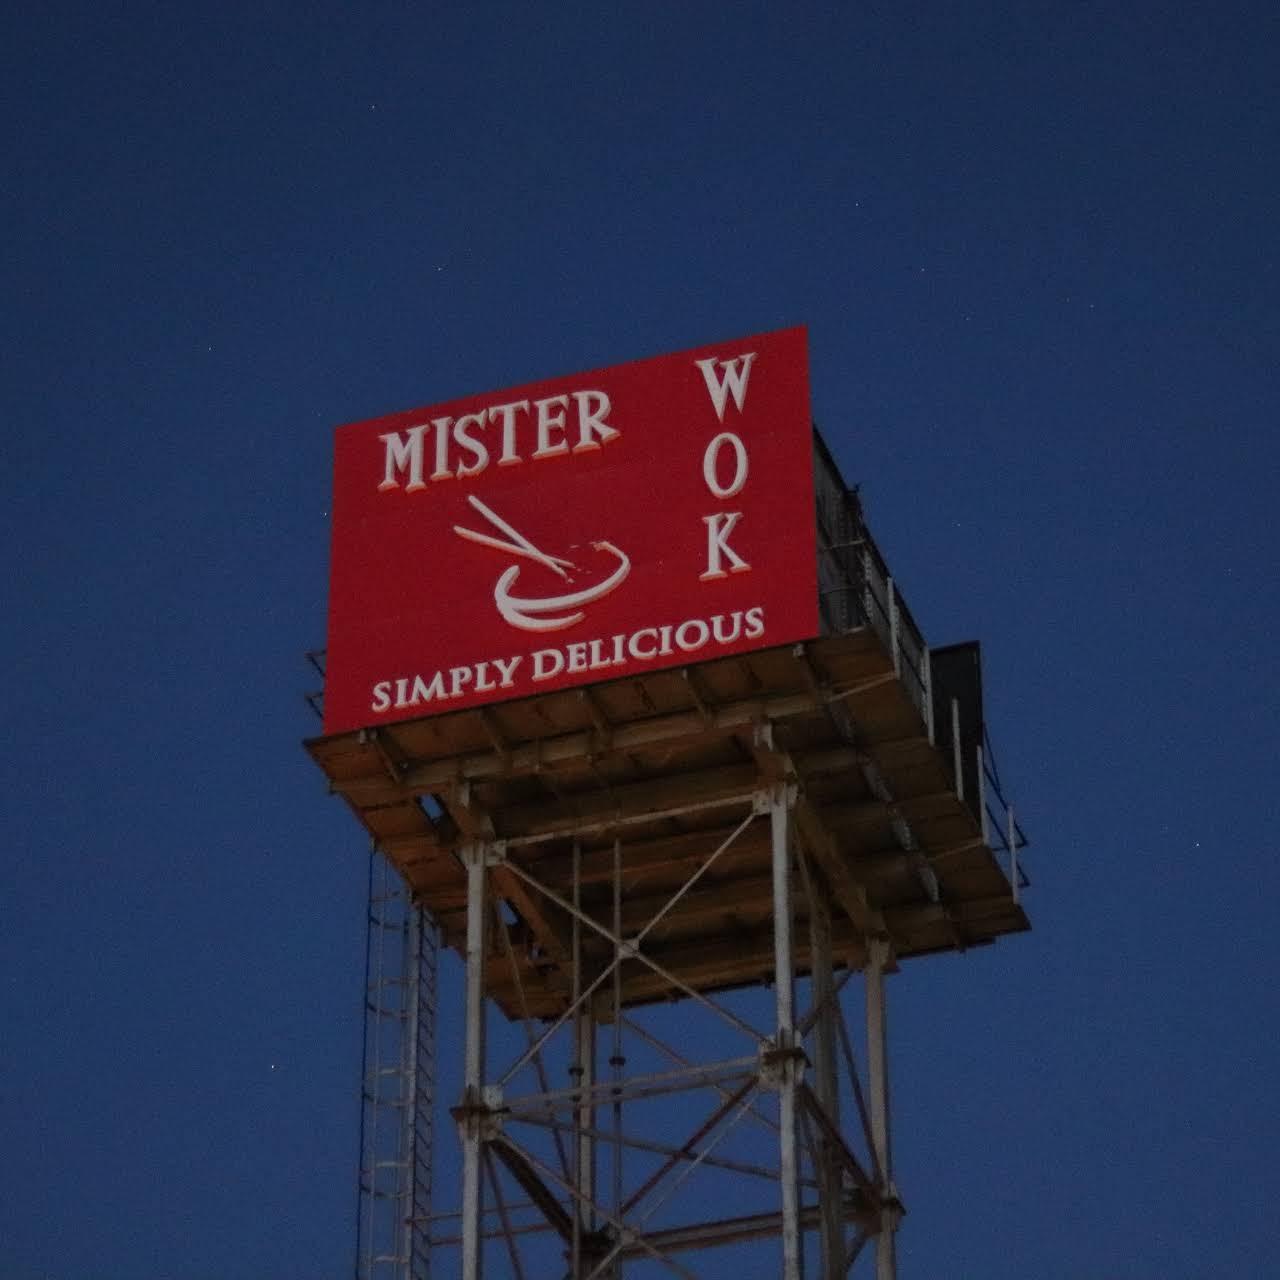 Mister Wok Parklands - Chinese Restaurant in Nairobi